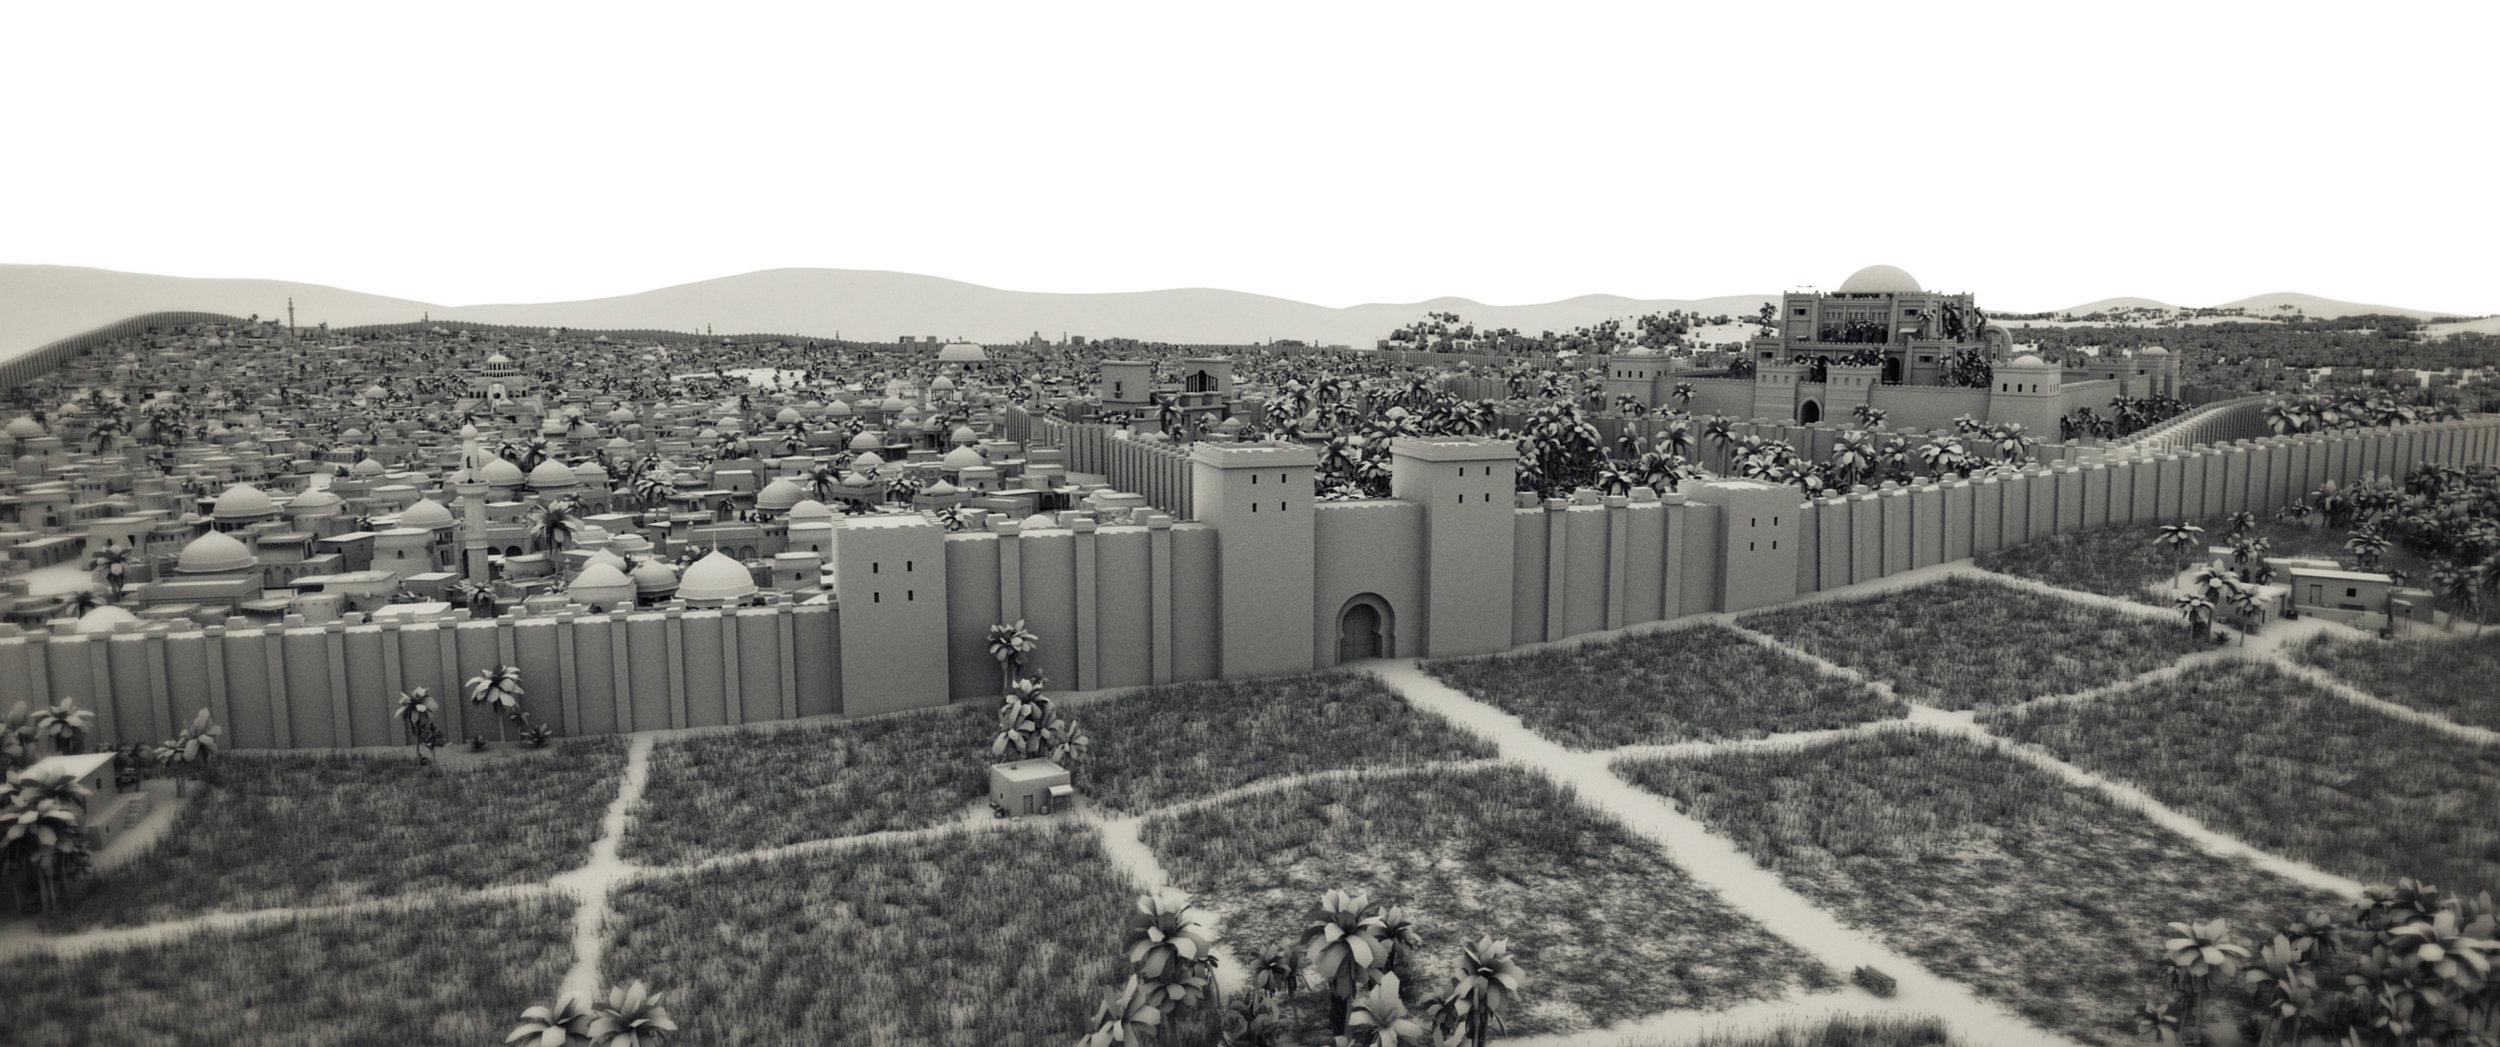 City Wide 05 - gray.jpg